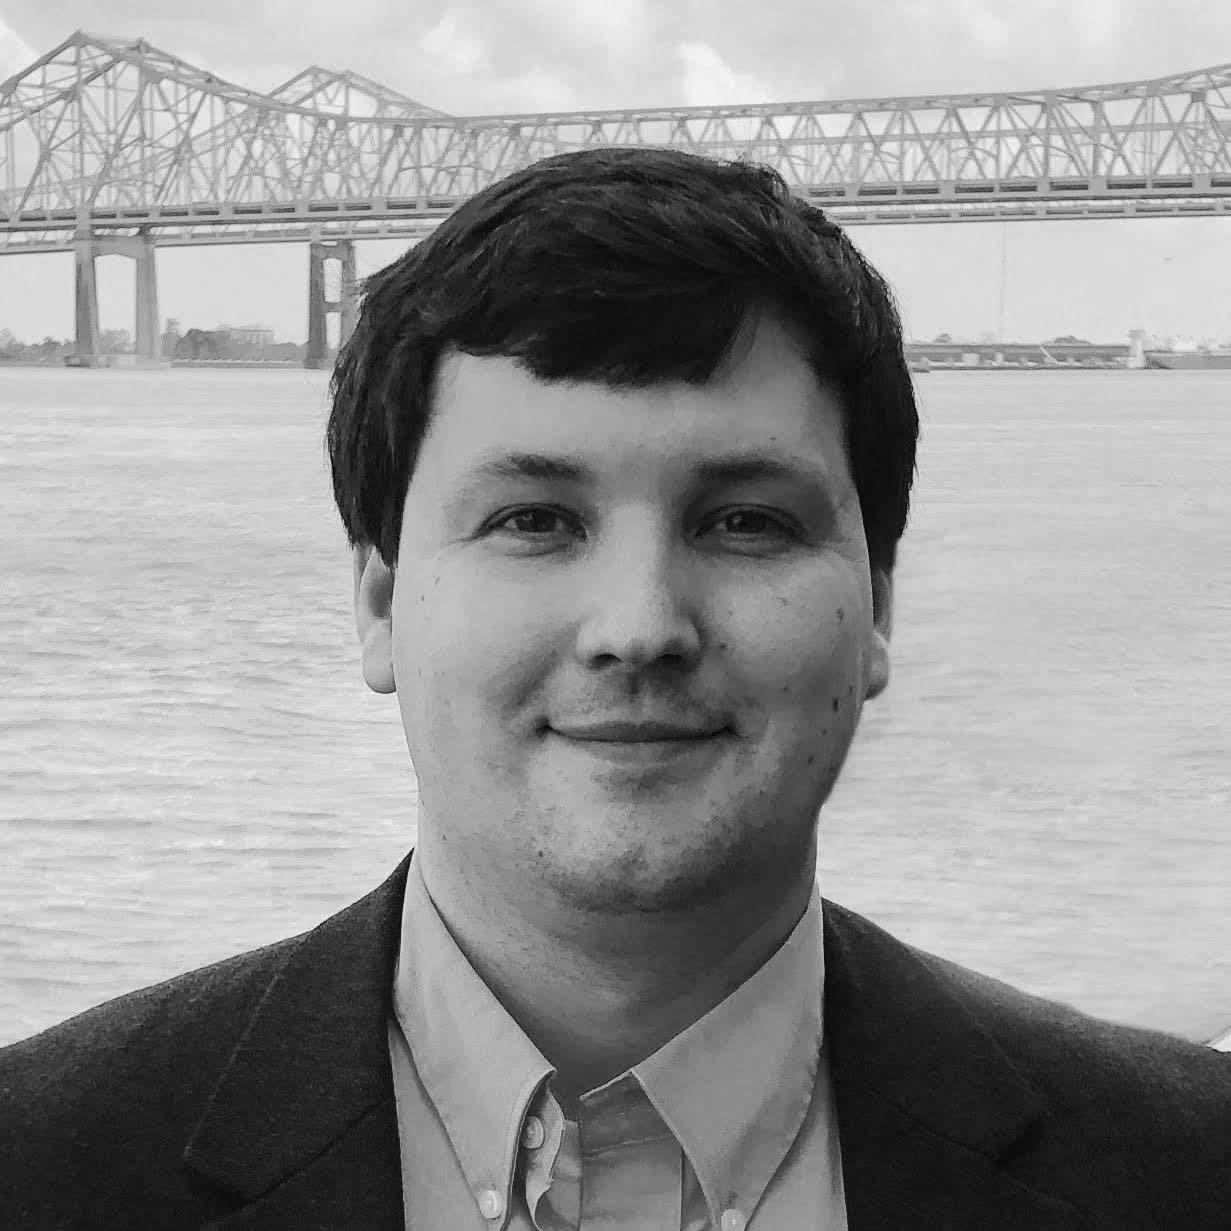 Phillip G. Levasseur, EHS Specialist; Cabot Oil & Gas Corp.